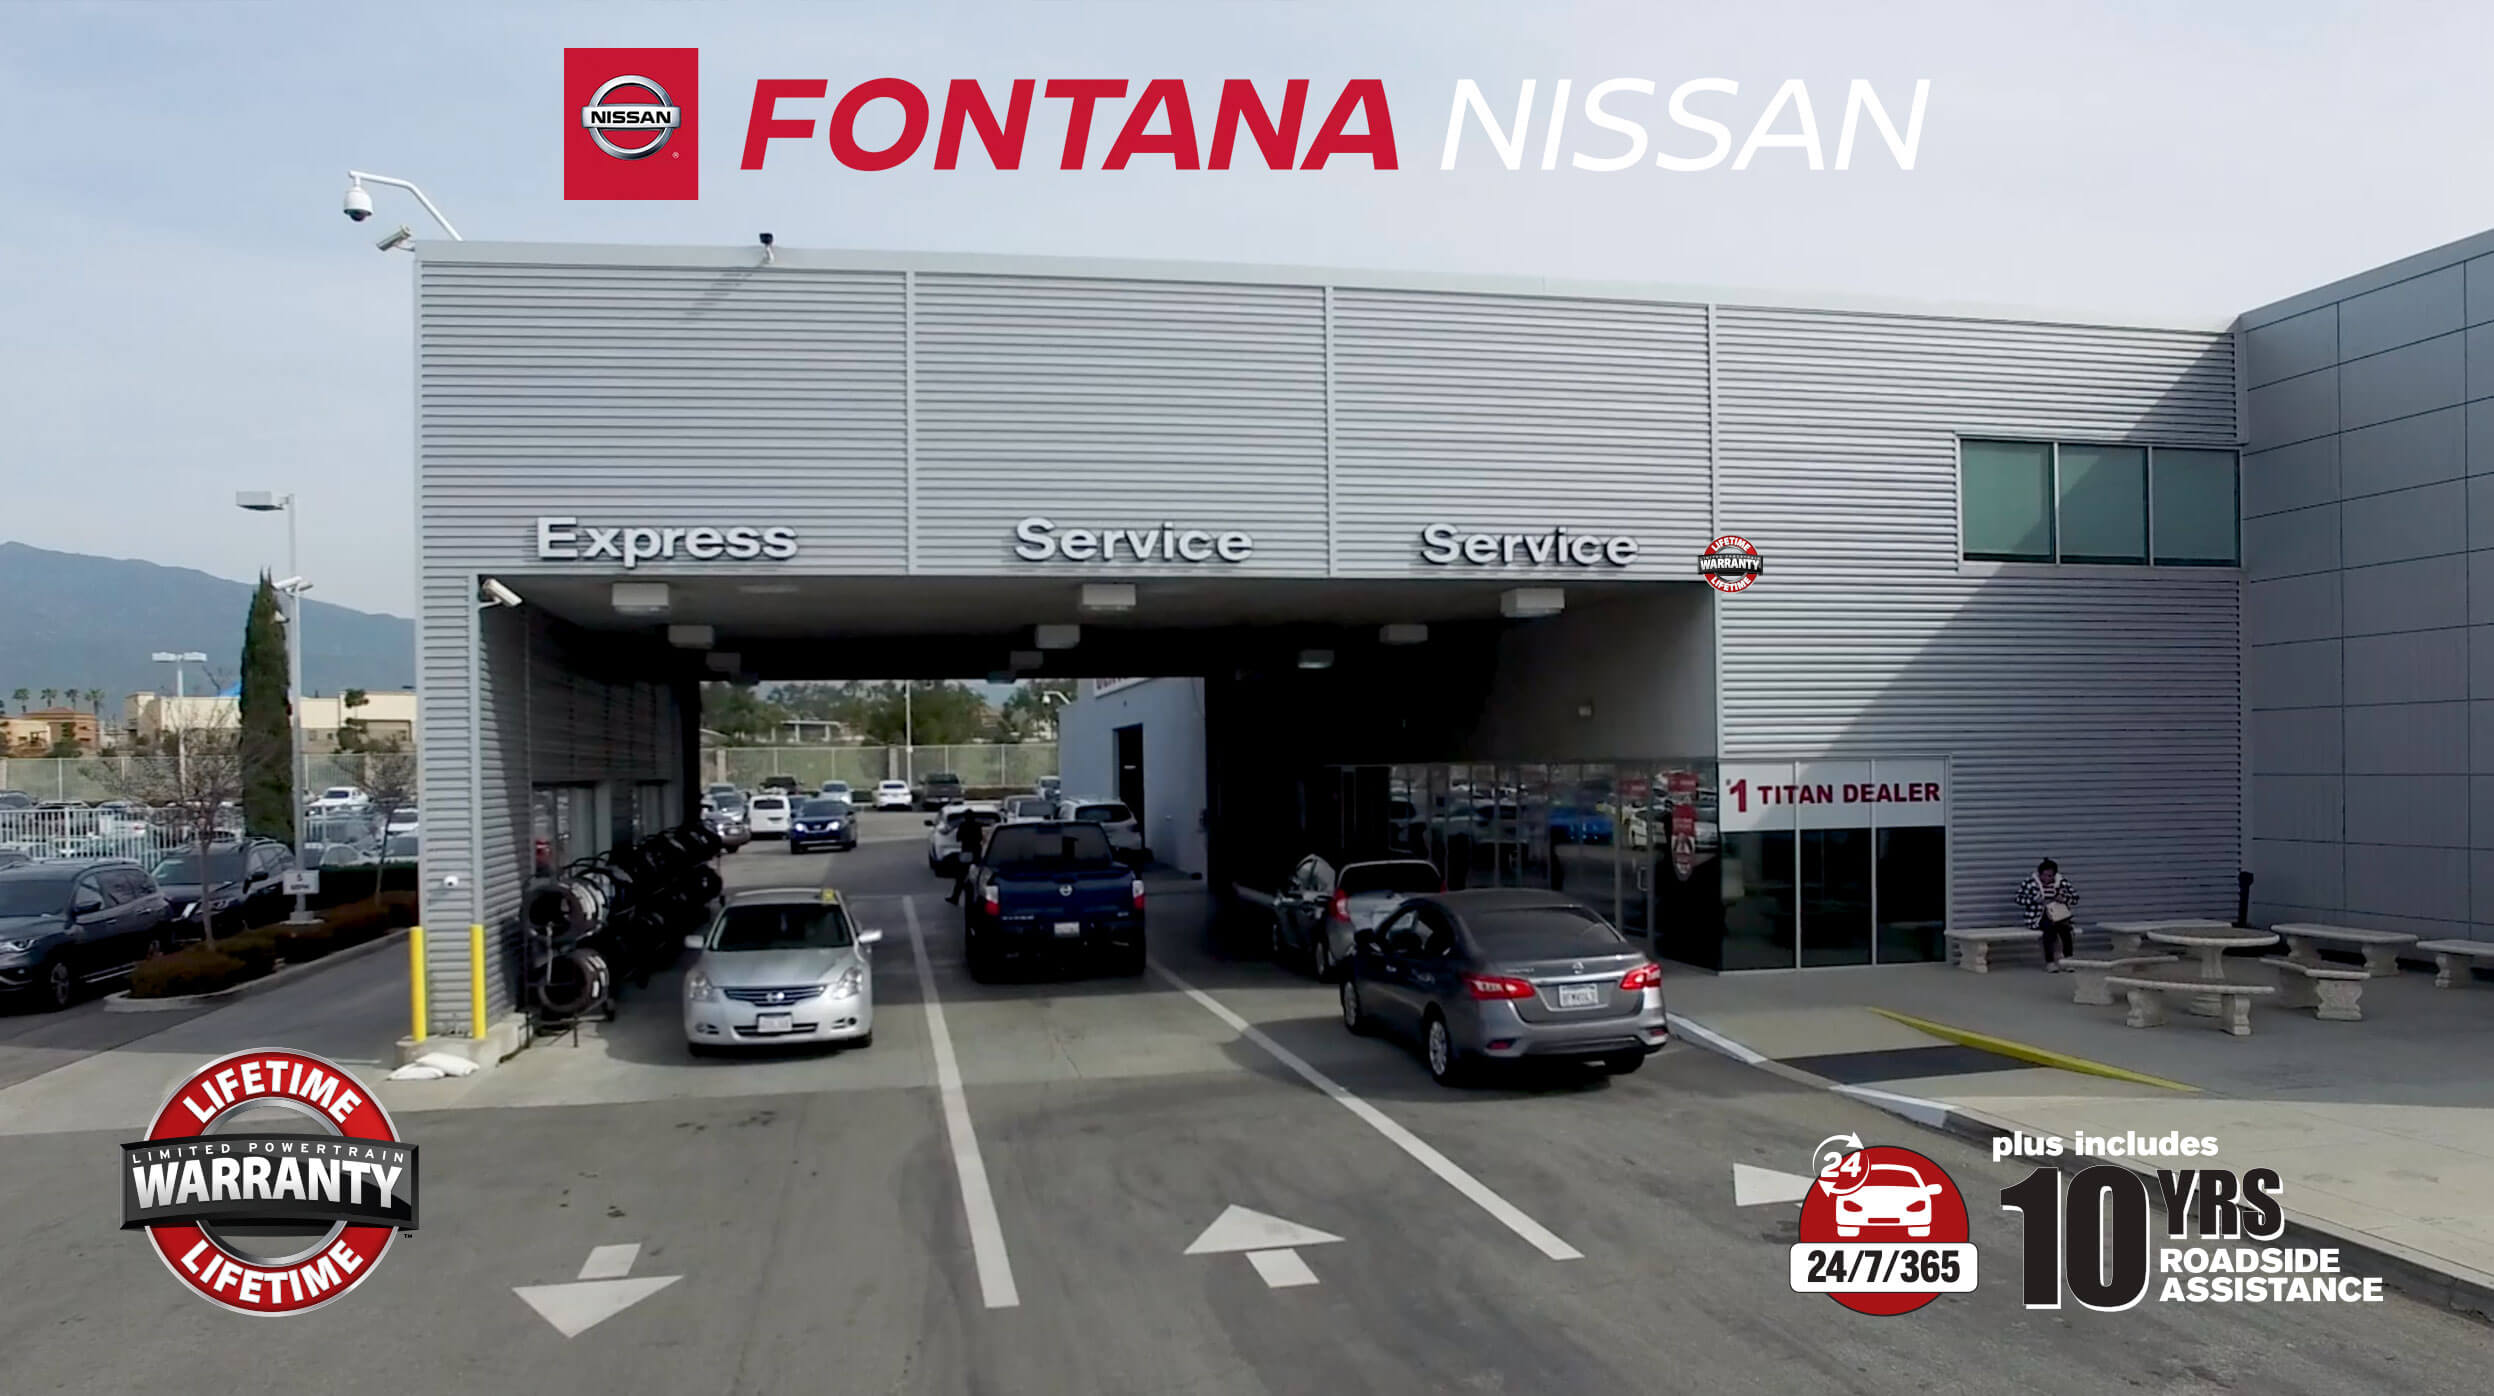 Fontana Nissan Lifetime Warranty